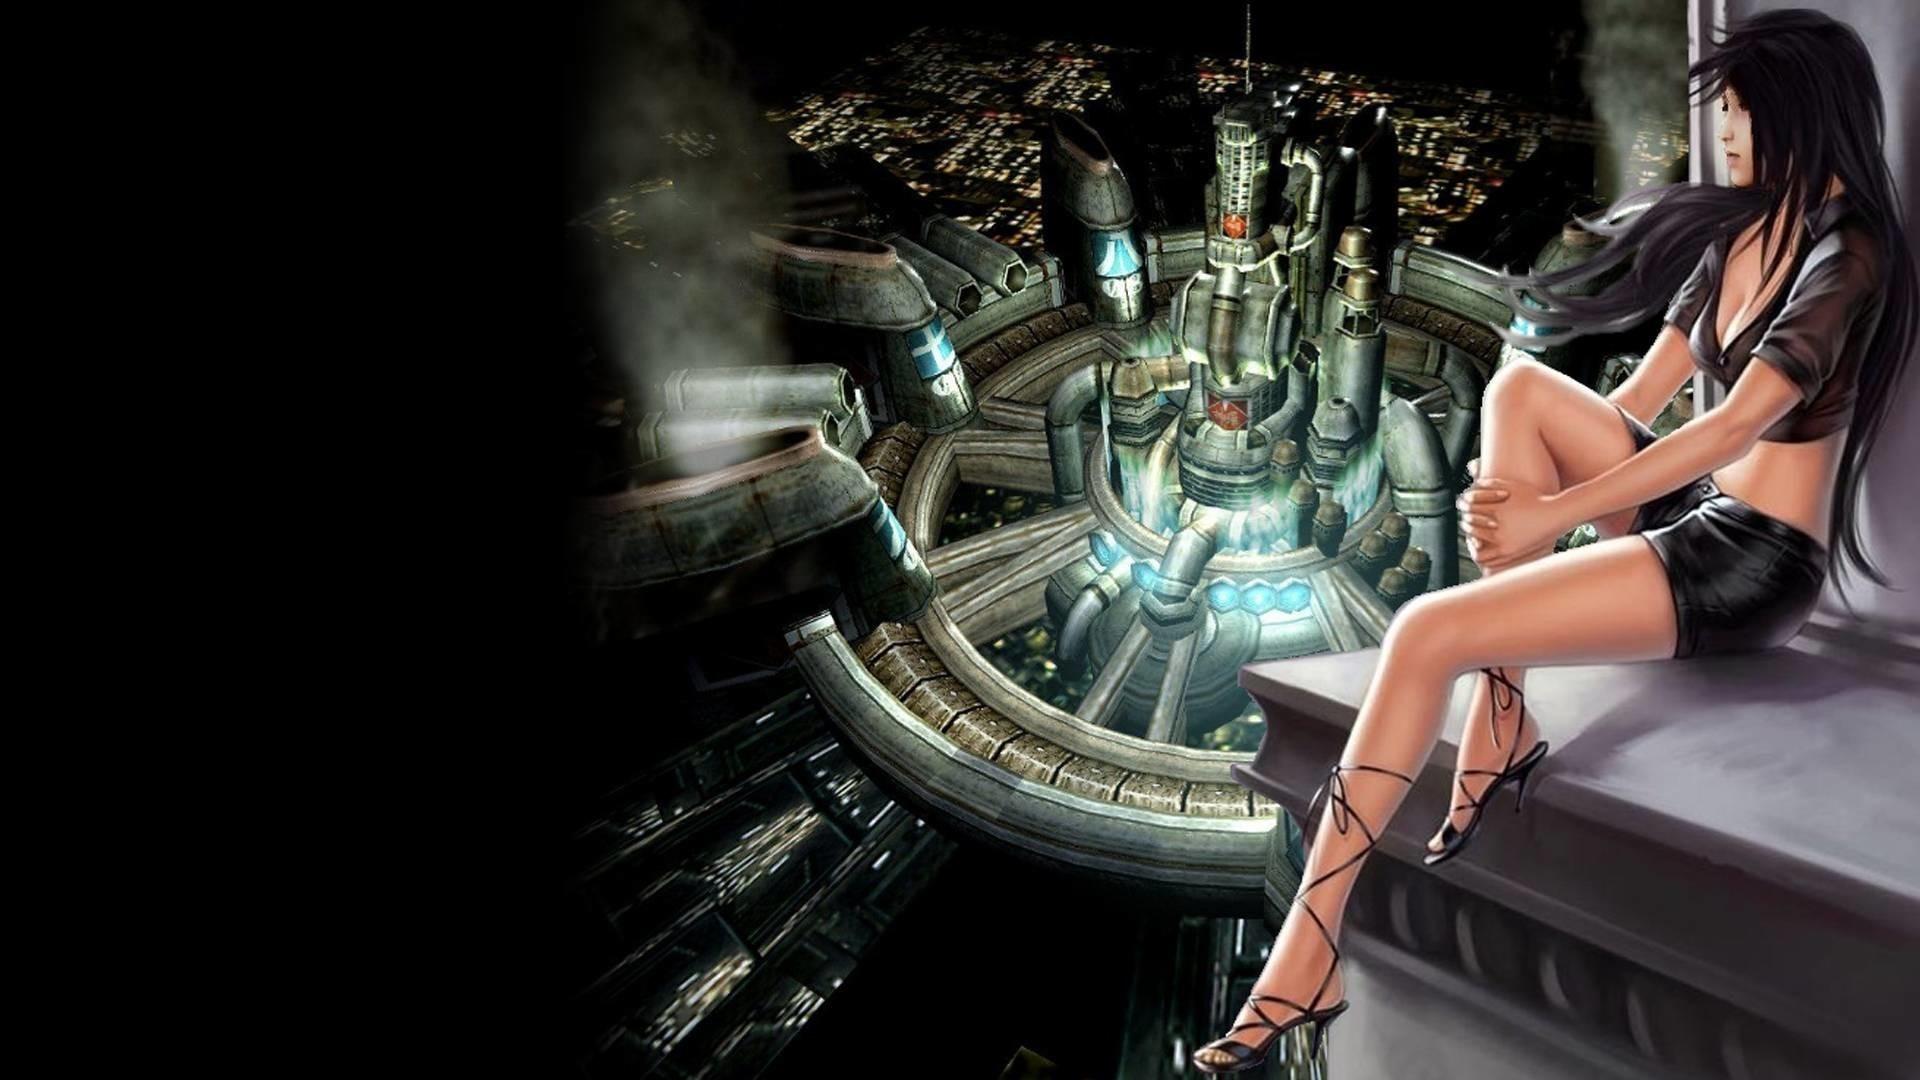 Final Fantasy Vii Wallpaper Wengerluggagesave